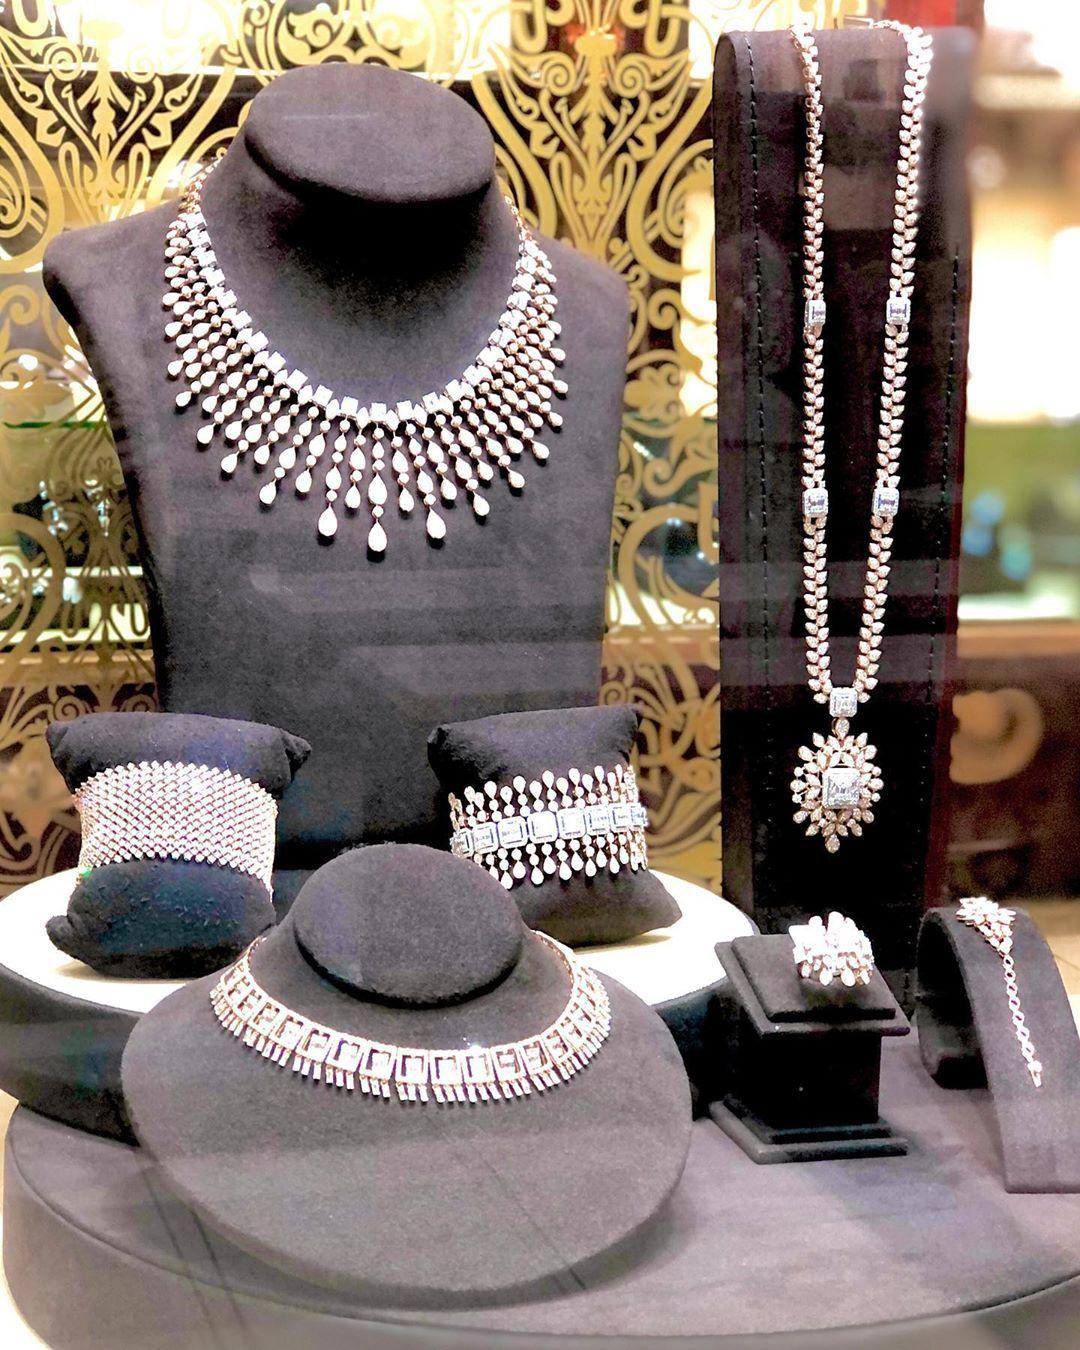 Devjiaurum Has The Most Breathtaking Exquisite Pieces In Their Store At Al Aali Mall Devjiaurum لديه أفخم أنواع المجوهرات و الذهب م Panama Hat Hats Fashion